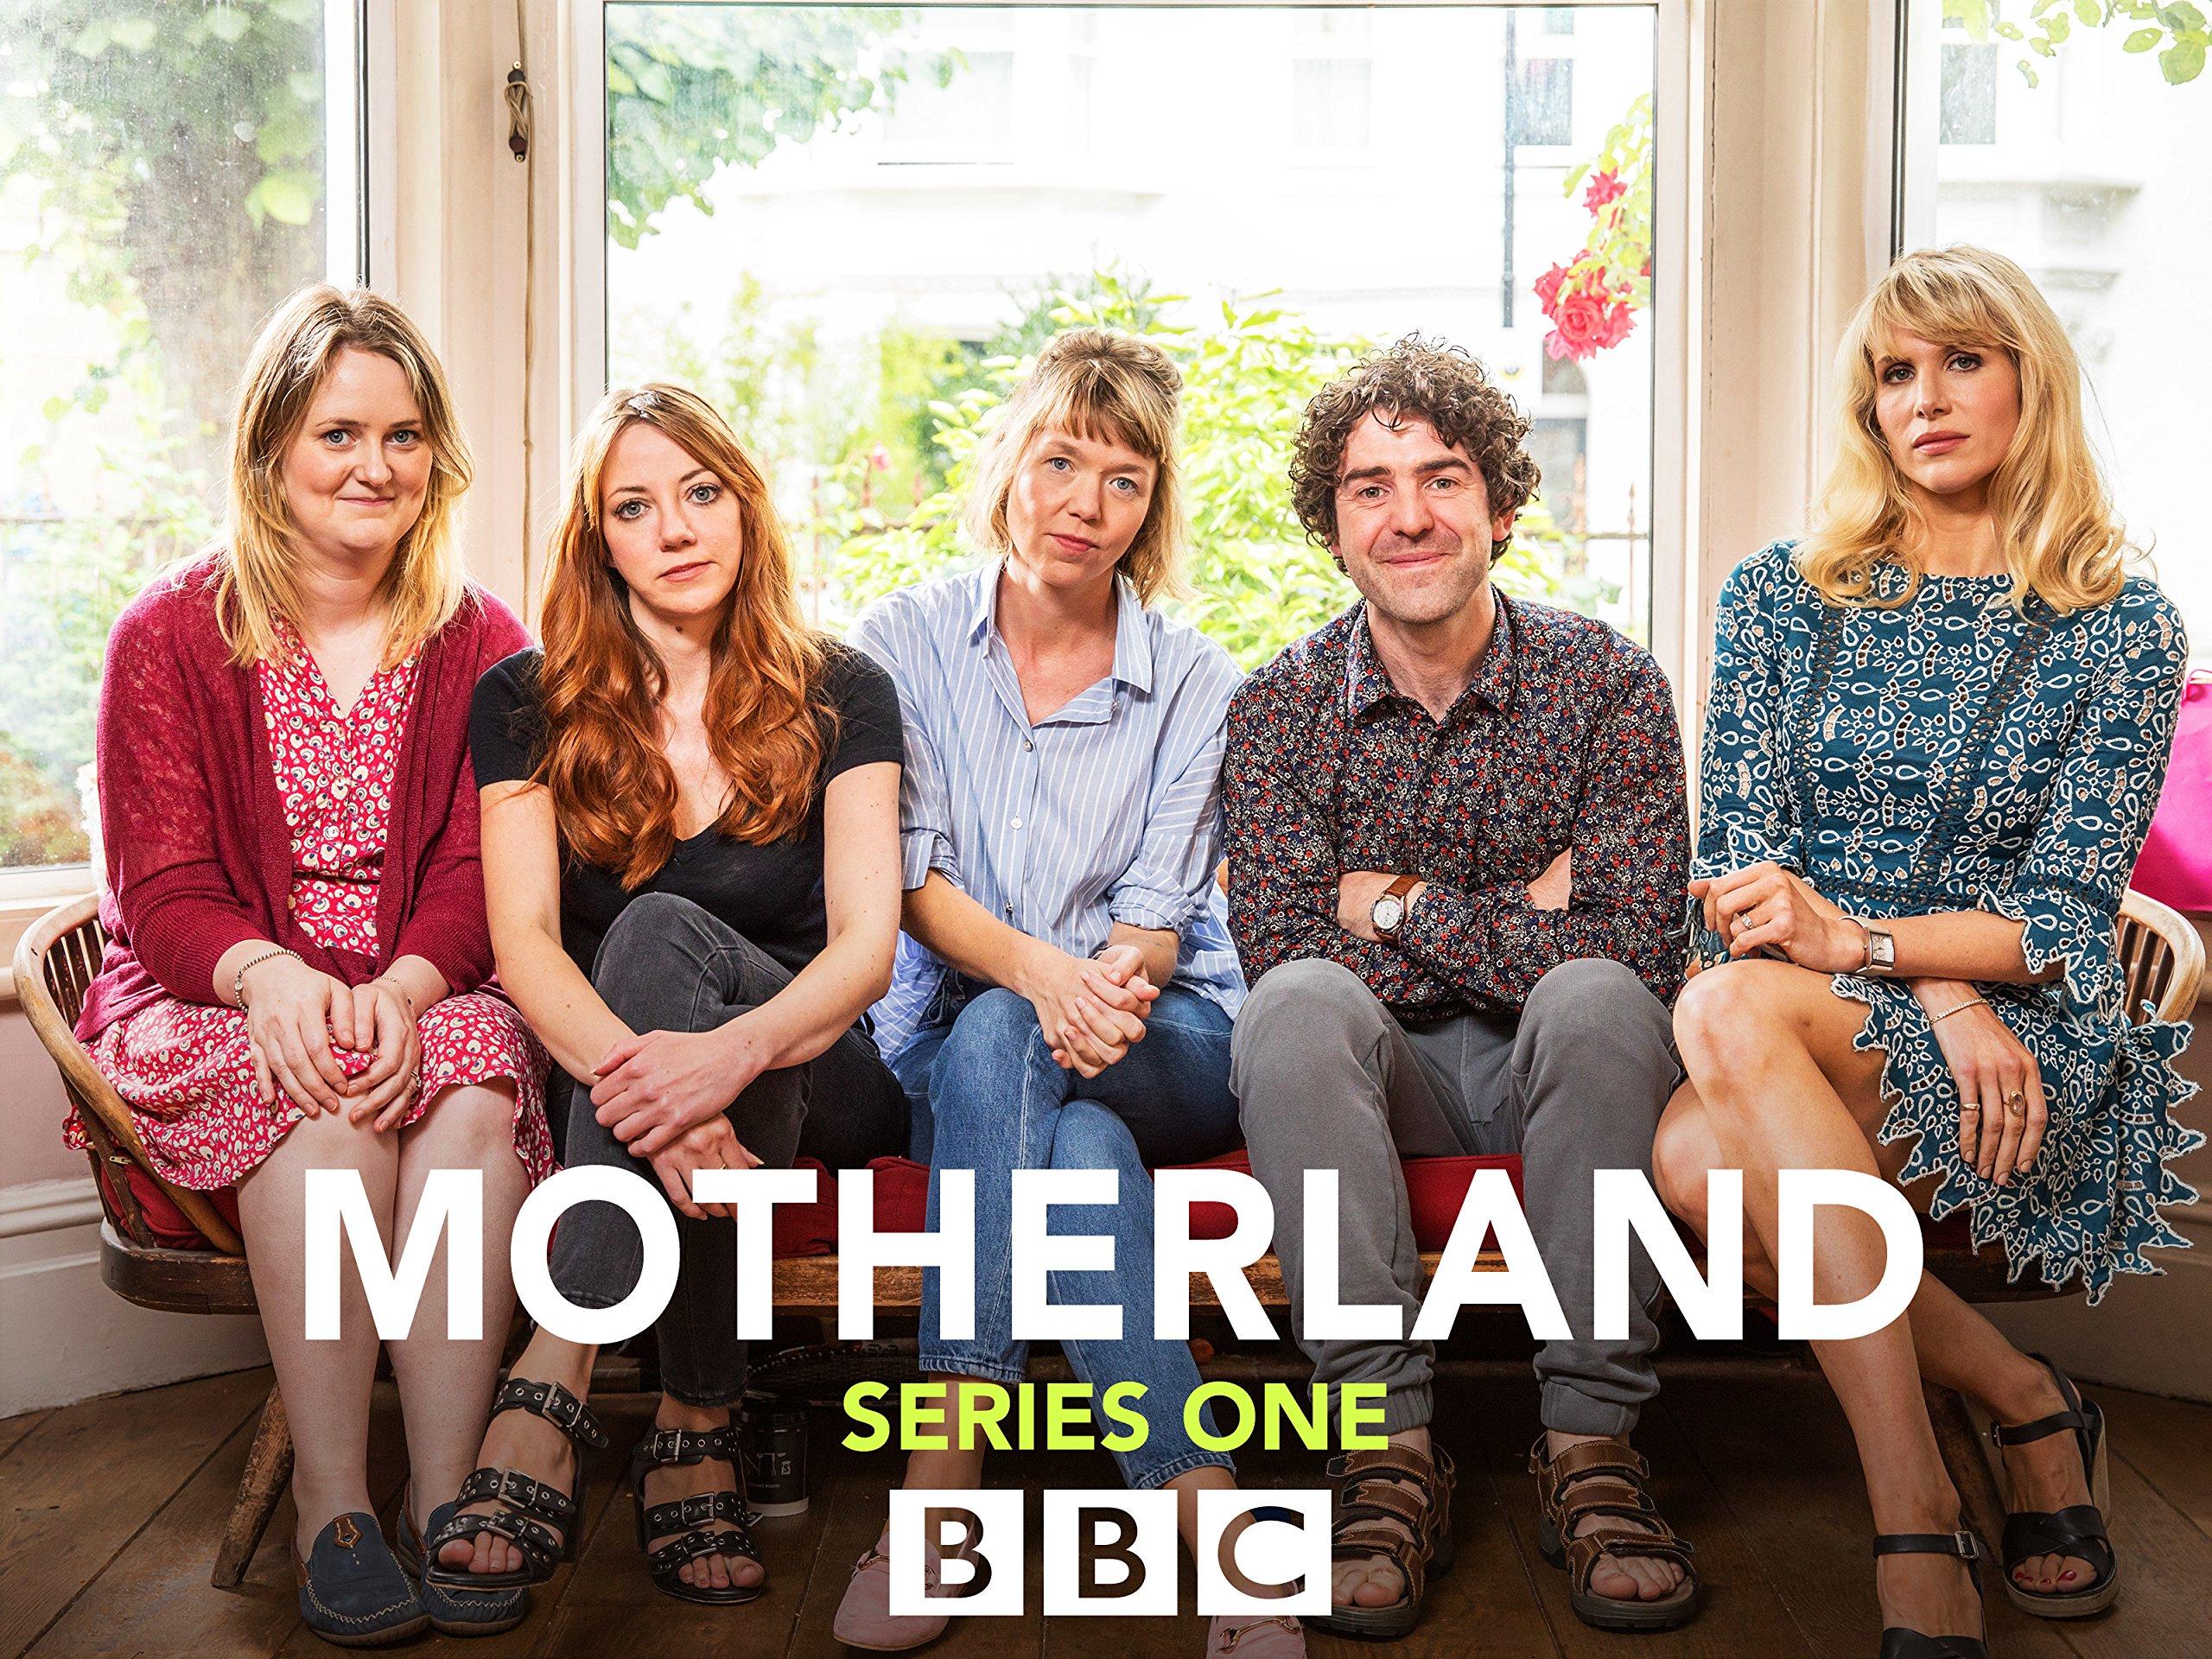 Amazon co uk: Watch Motherland, Series 1 | Prime Video